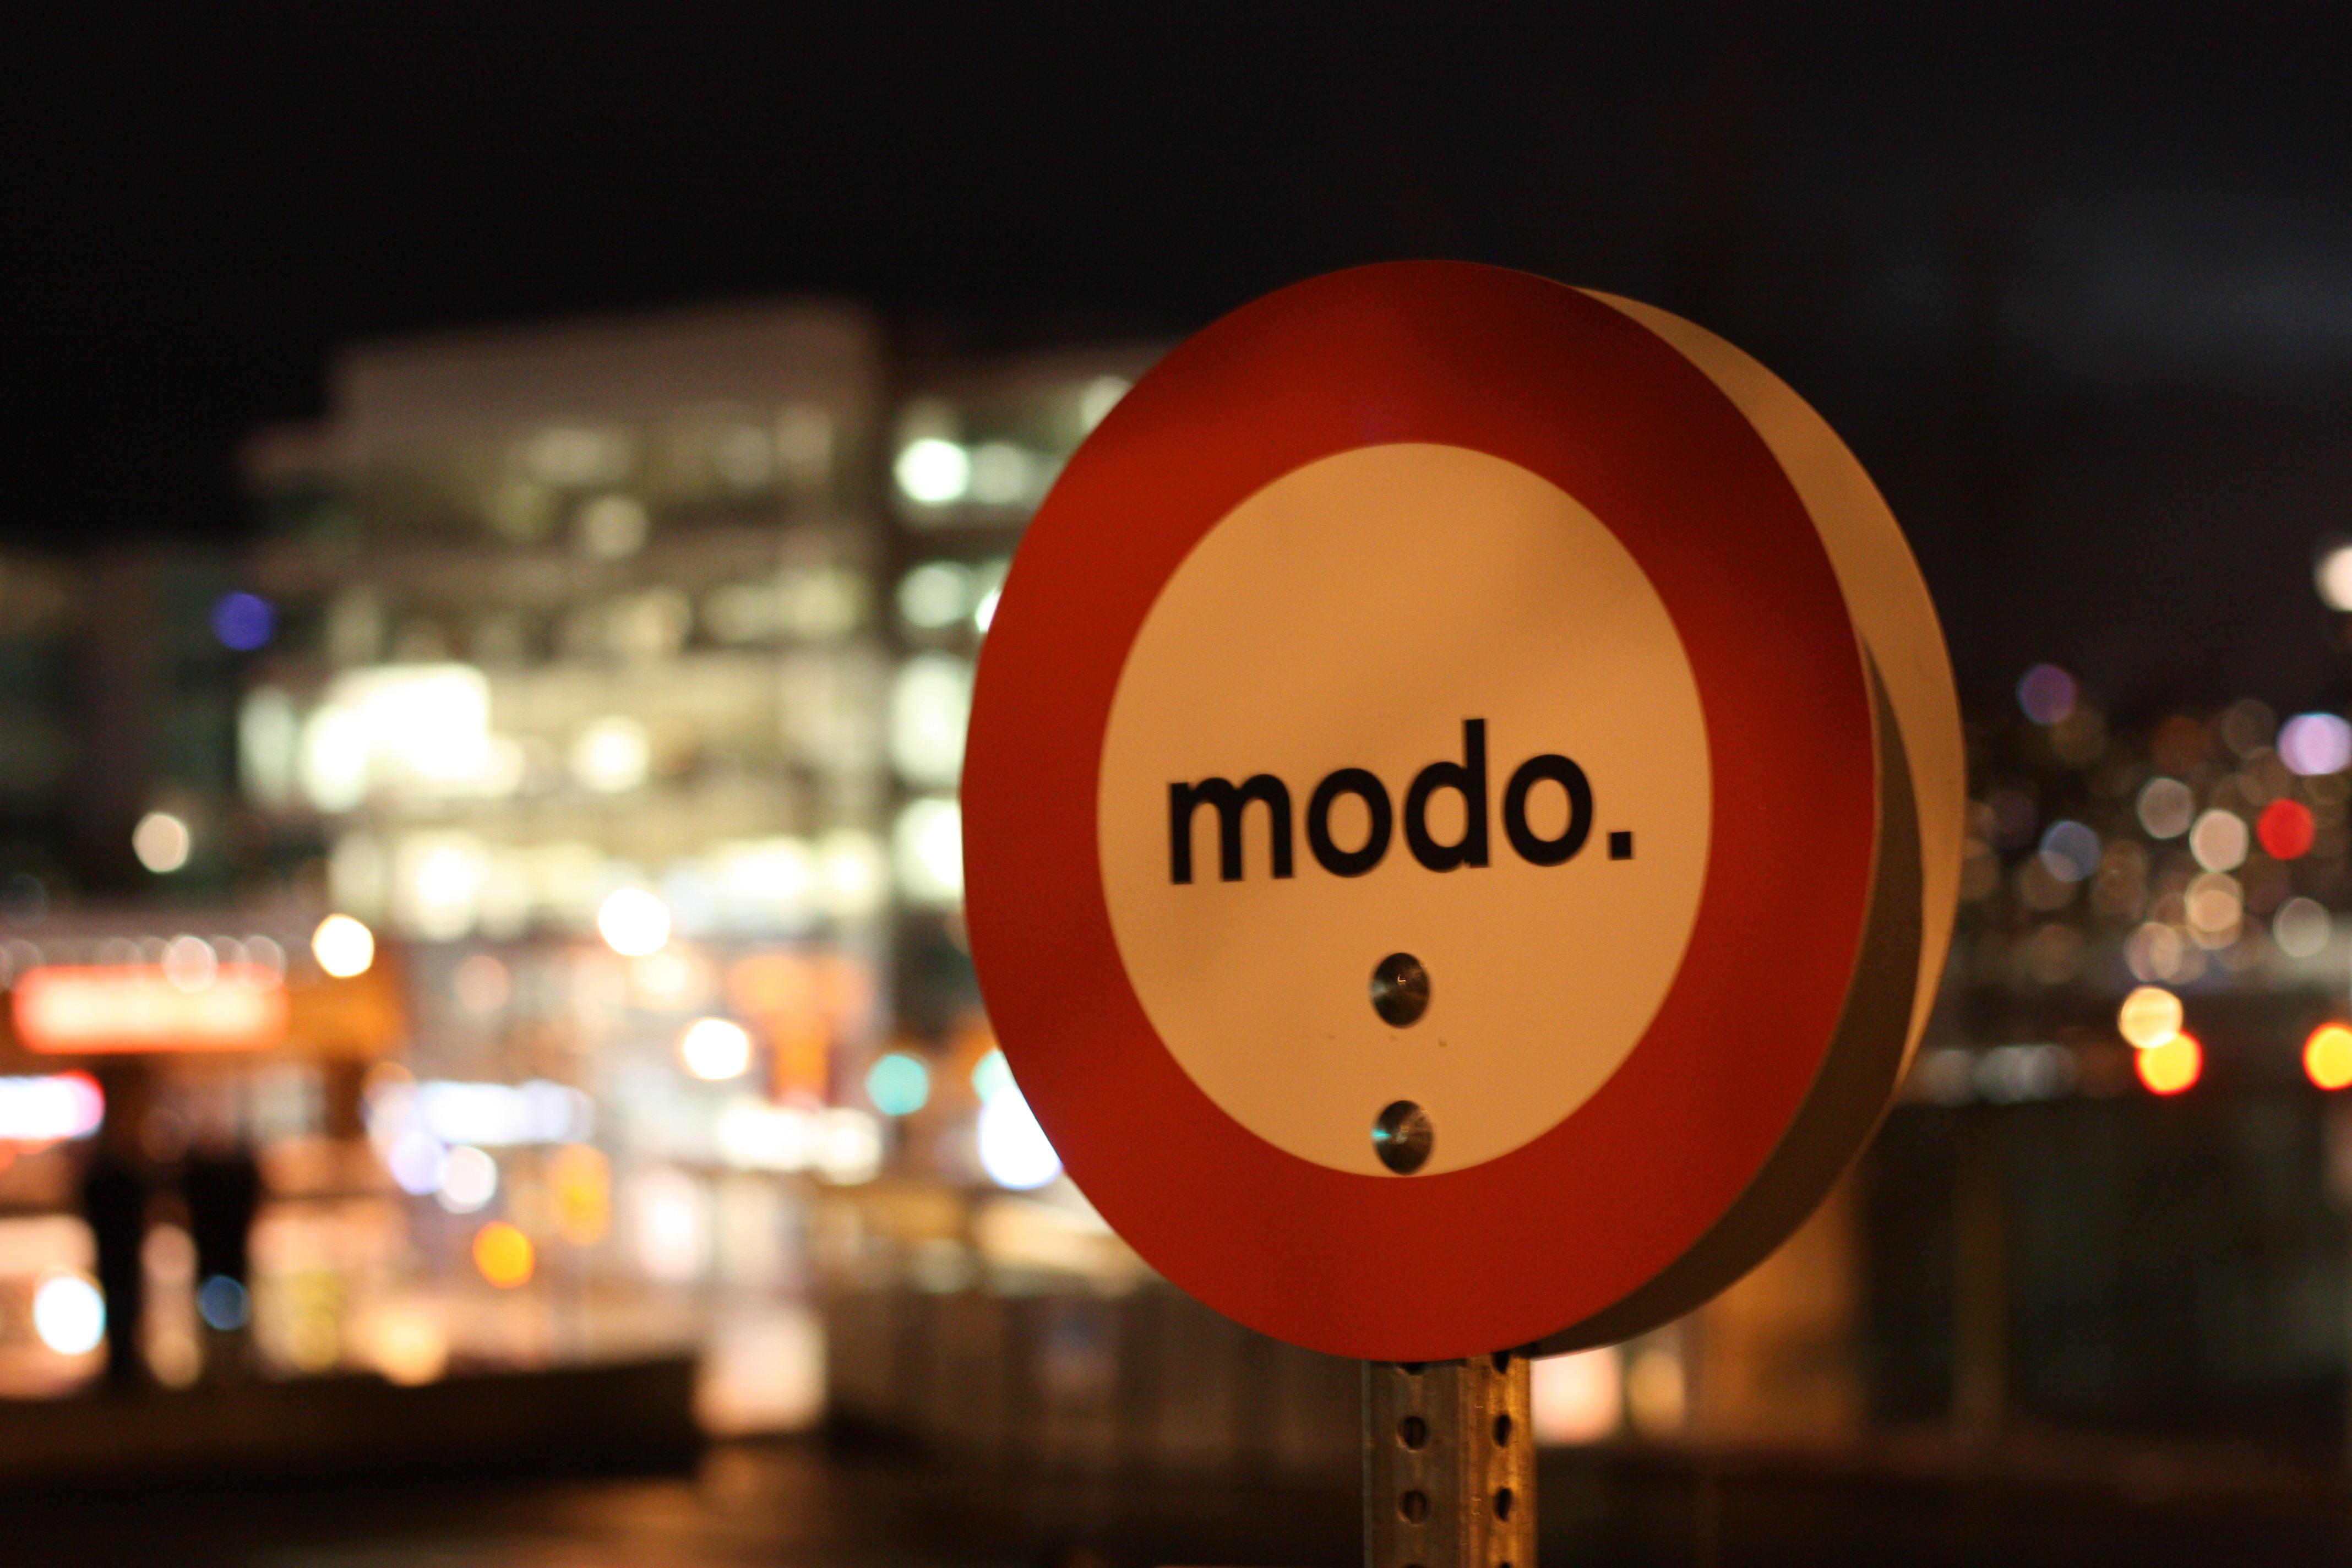 Modo sign at night